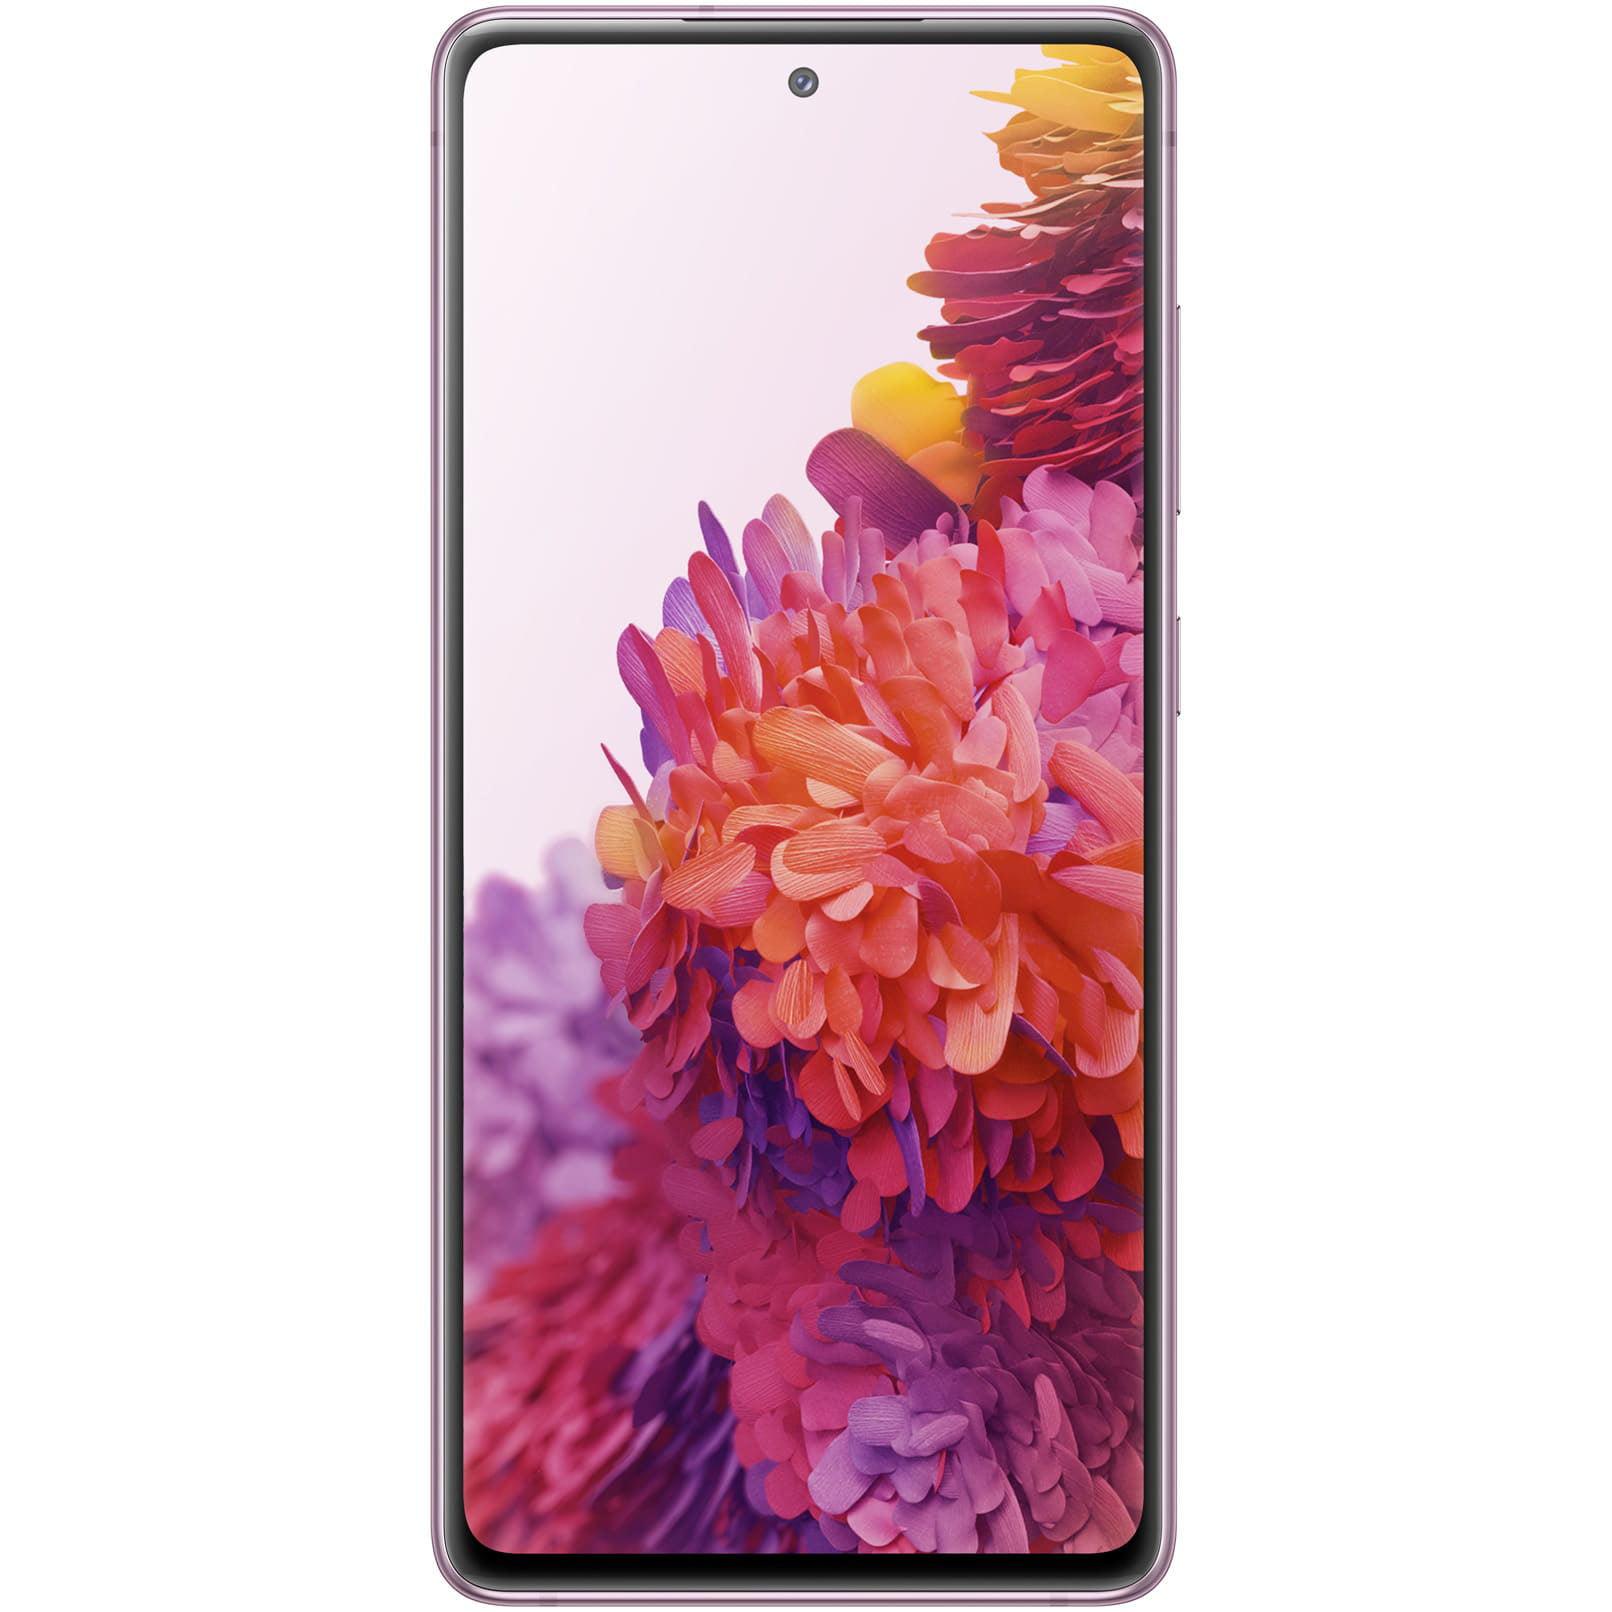 Telefon mobil Samsung Galaxy S20 FE, Dual SIM, 128GB, 6GB RAM, 4G, Cloud Lavender